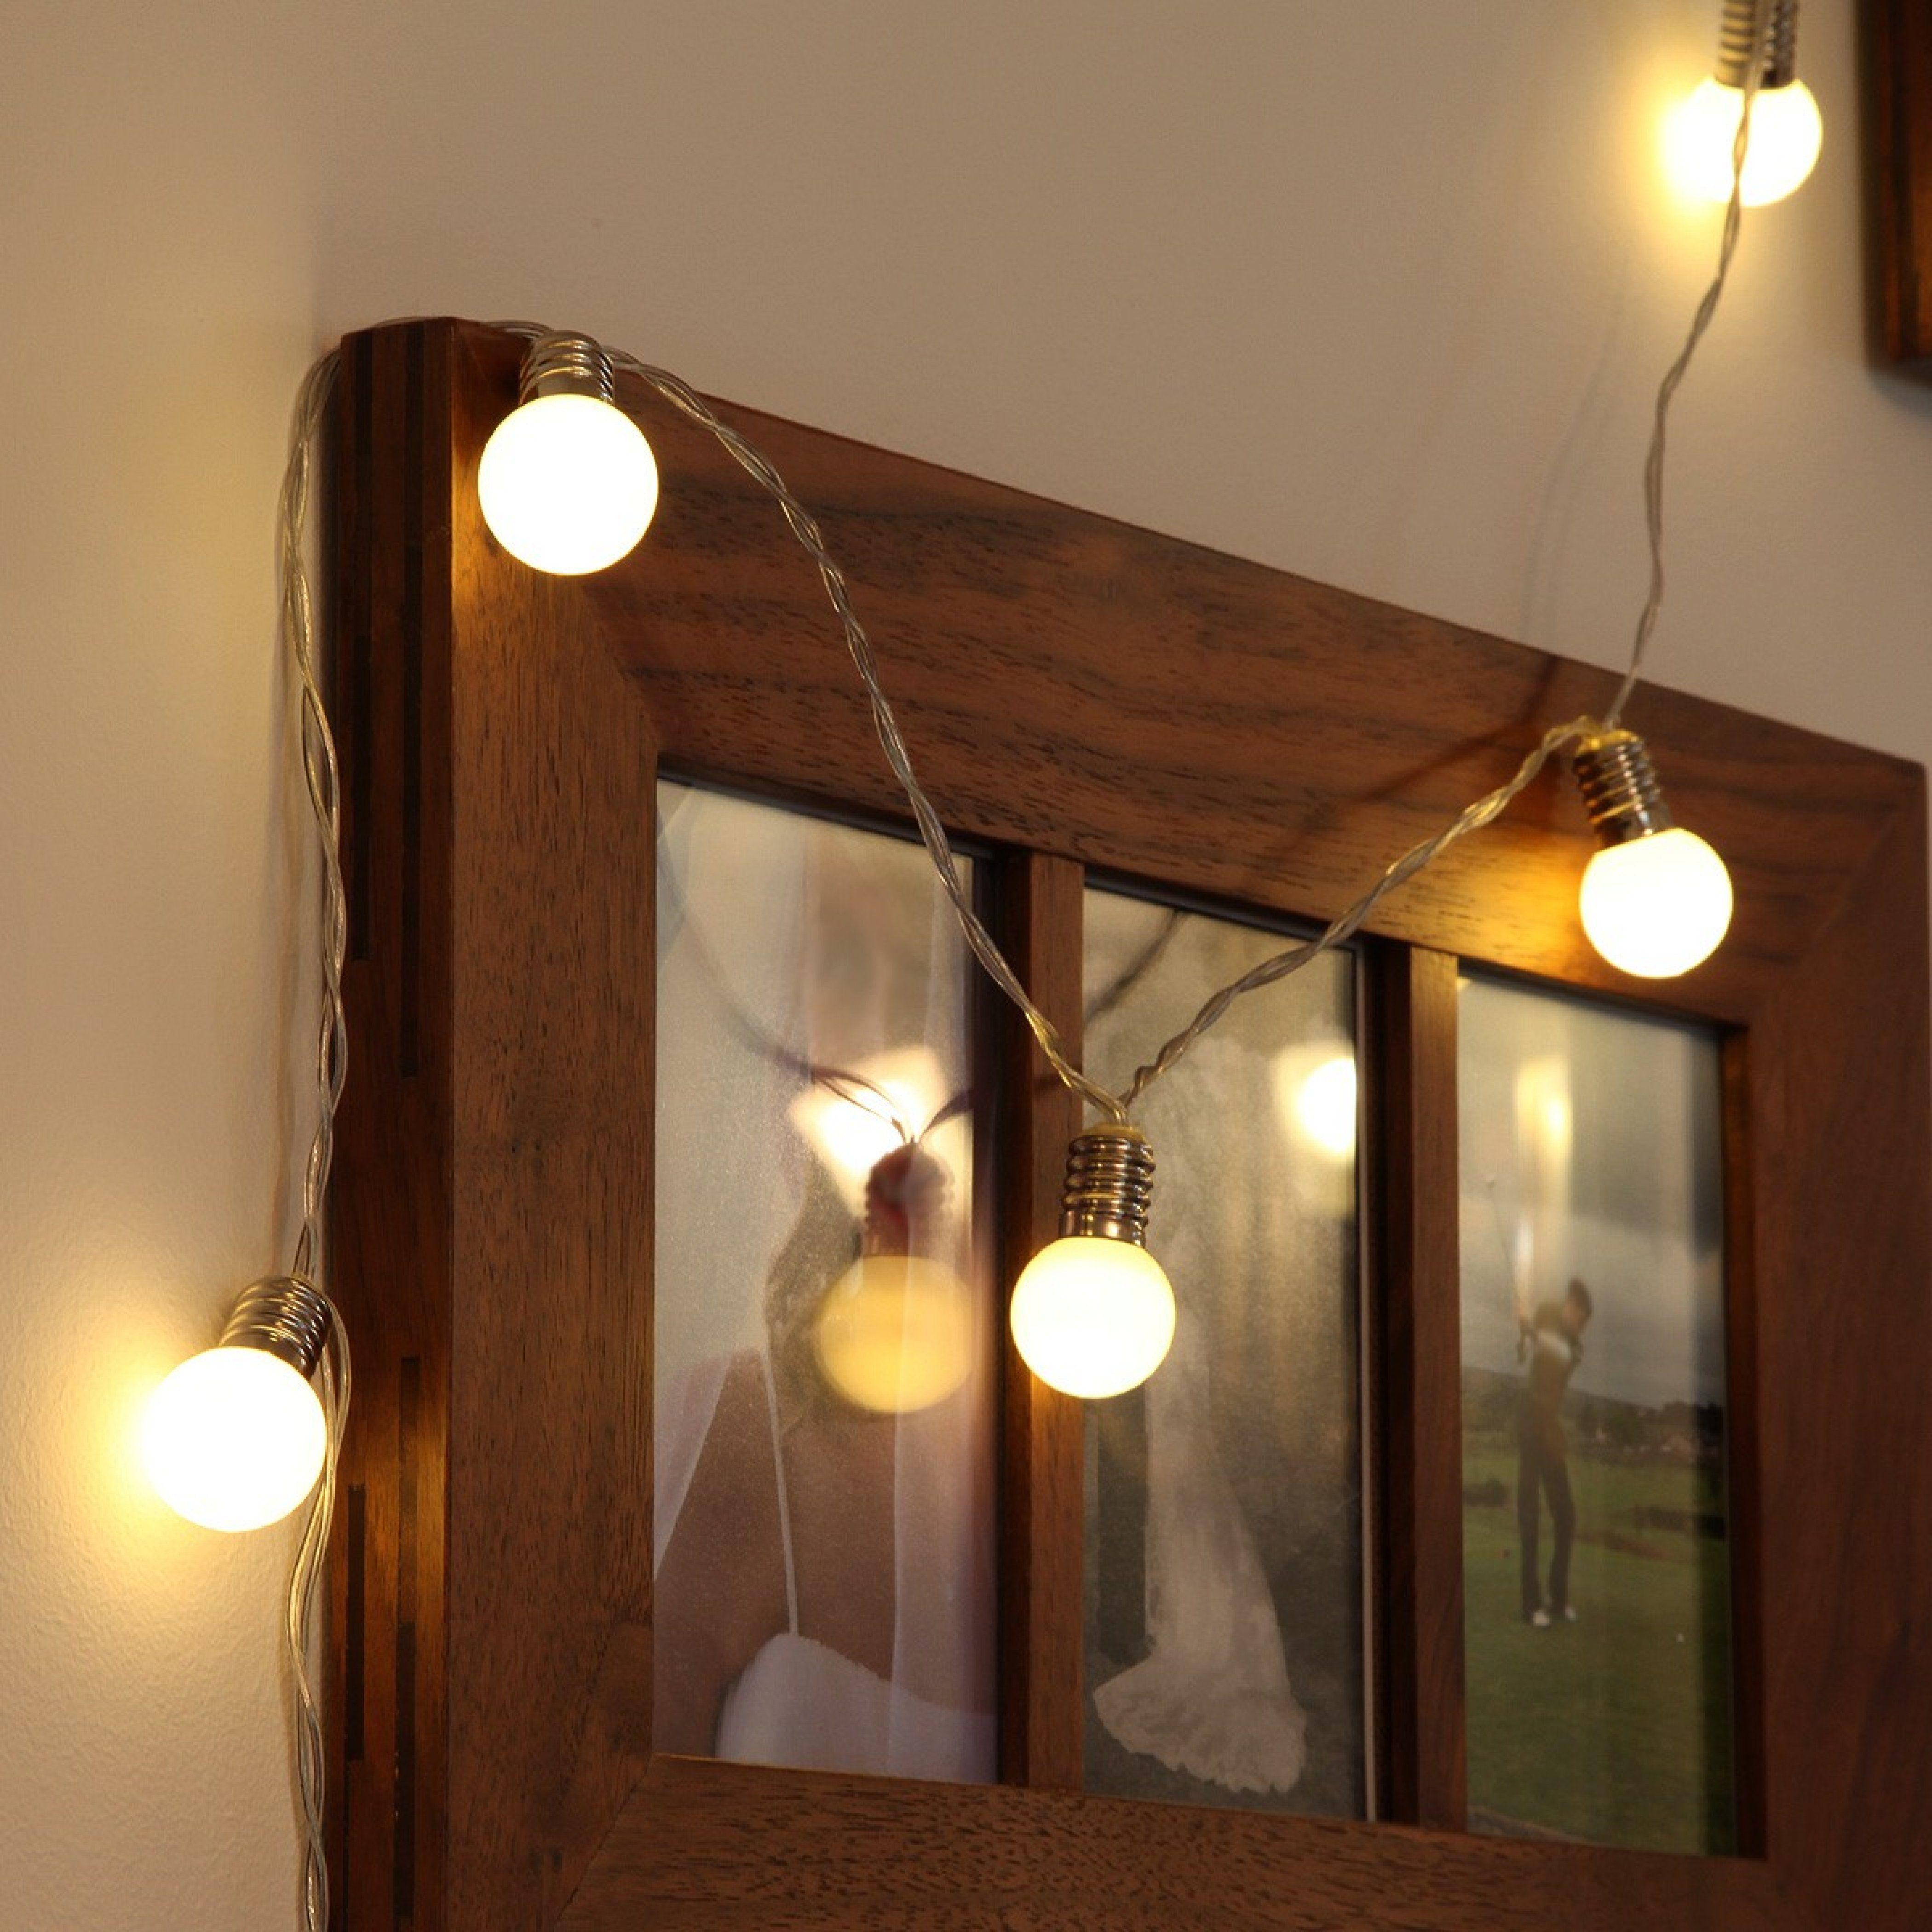 Battery Frosted Mini Festoon Bulb Fairy Lights 10 Warm White Leds Party Lichterkette Lichtergirlande Lichterkette